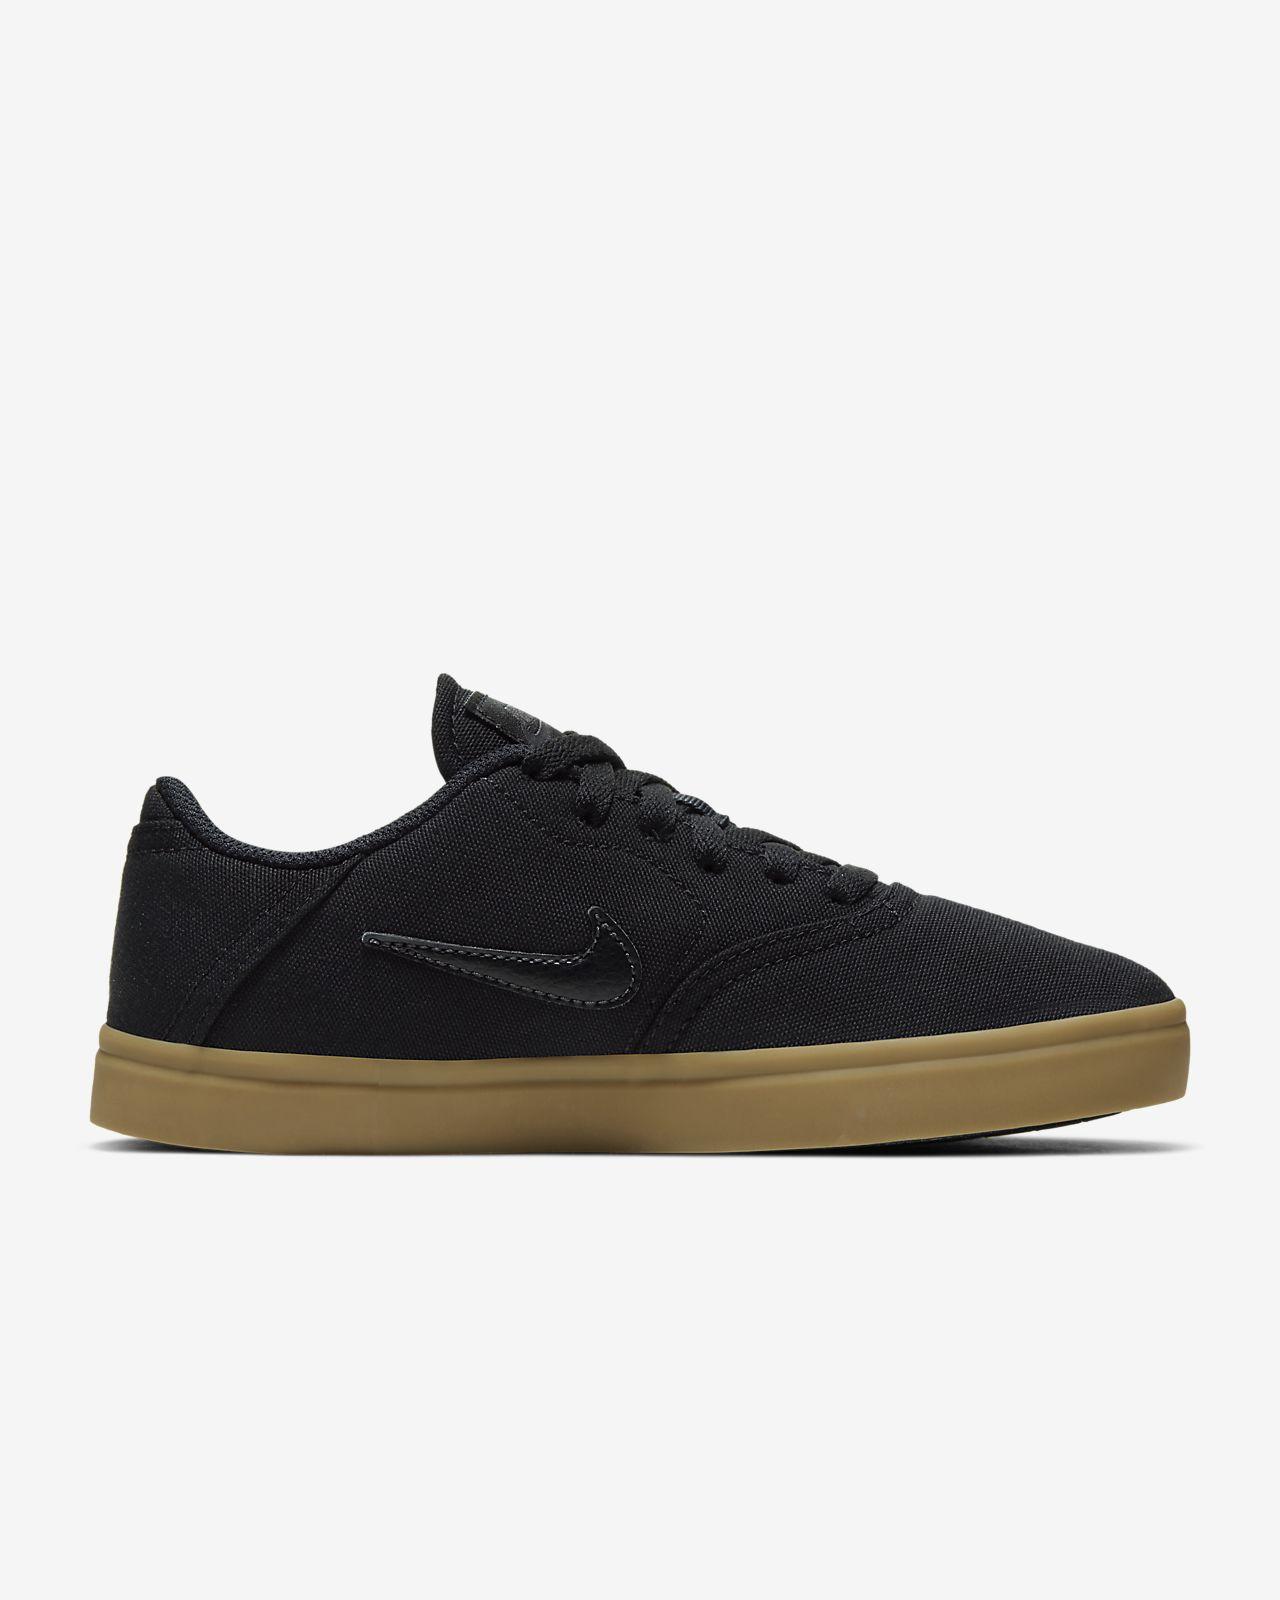 Nike SB Check Canvas Big Kids' Skateboarding Shoe